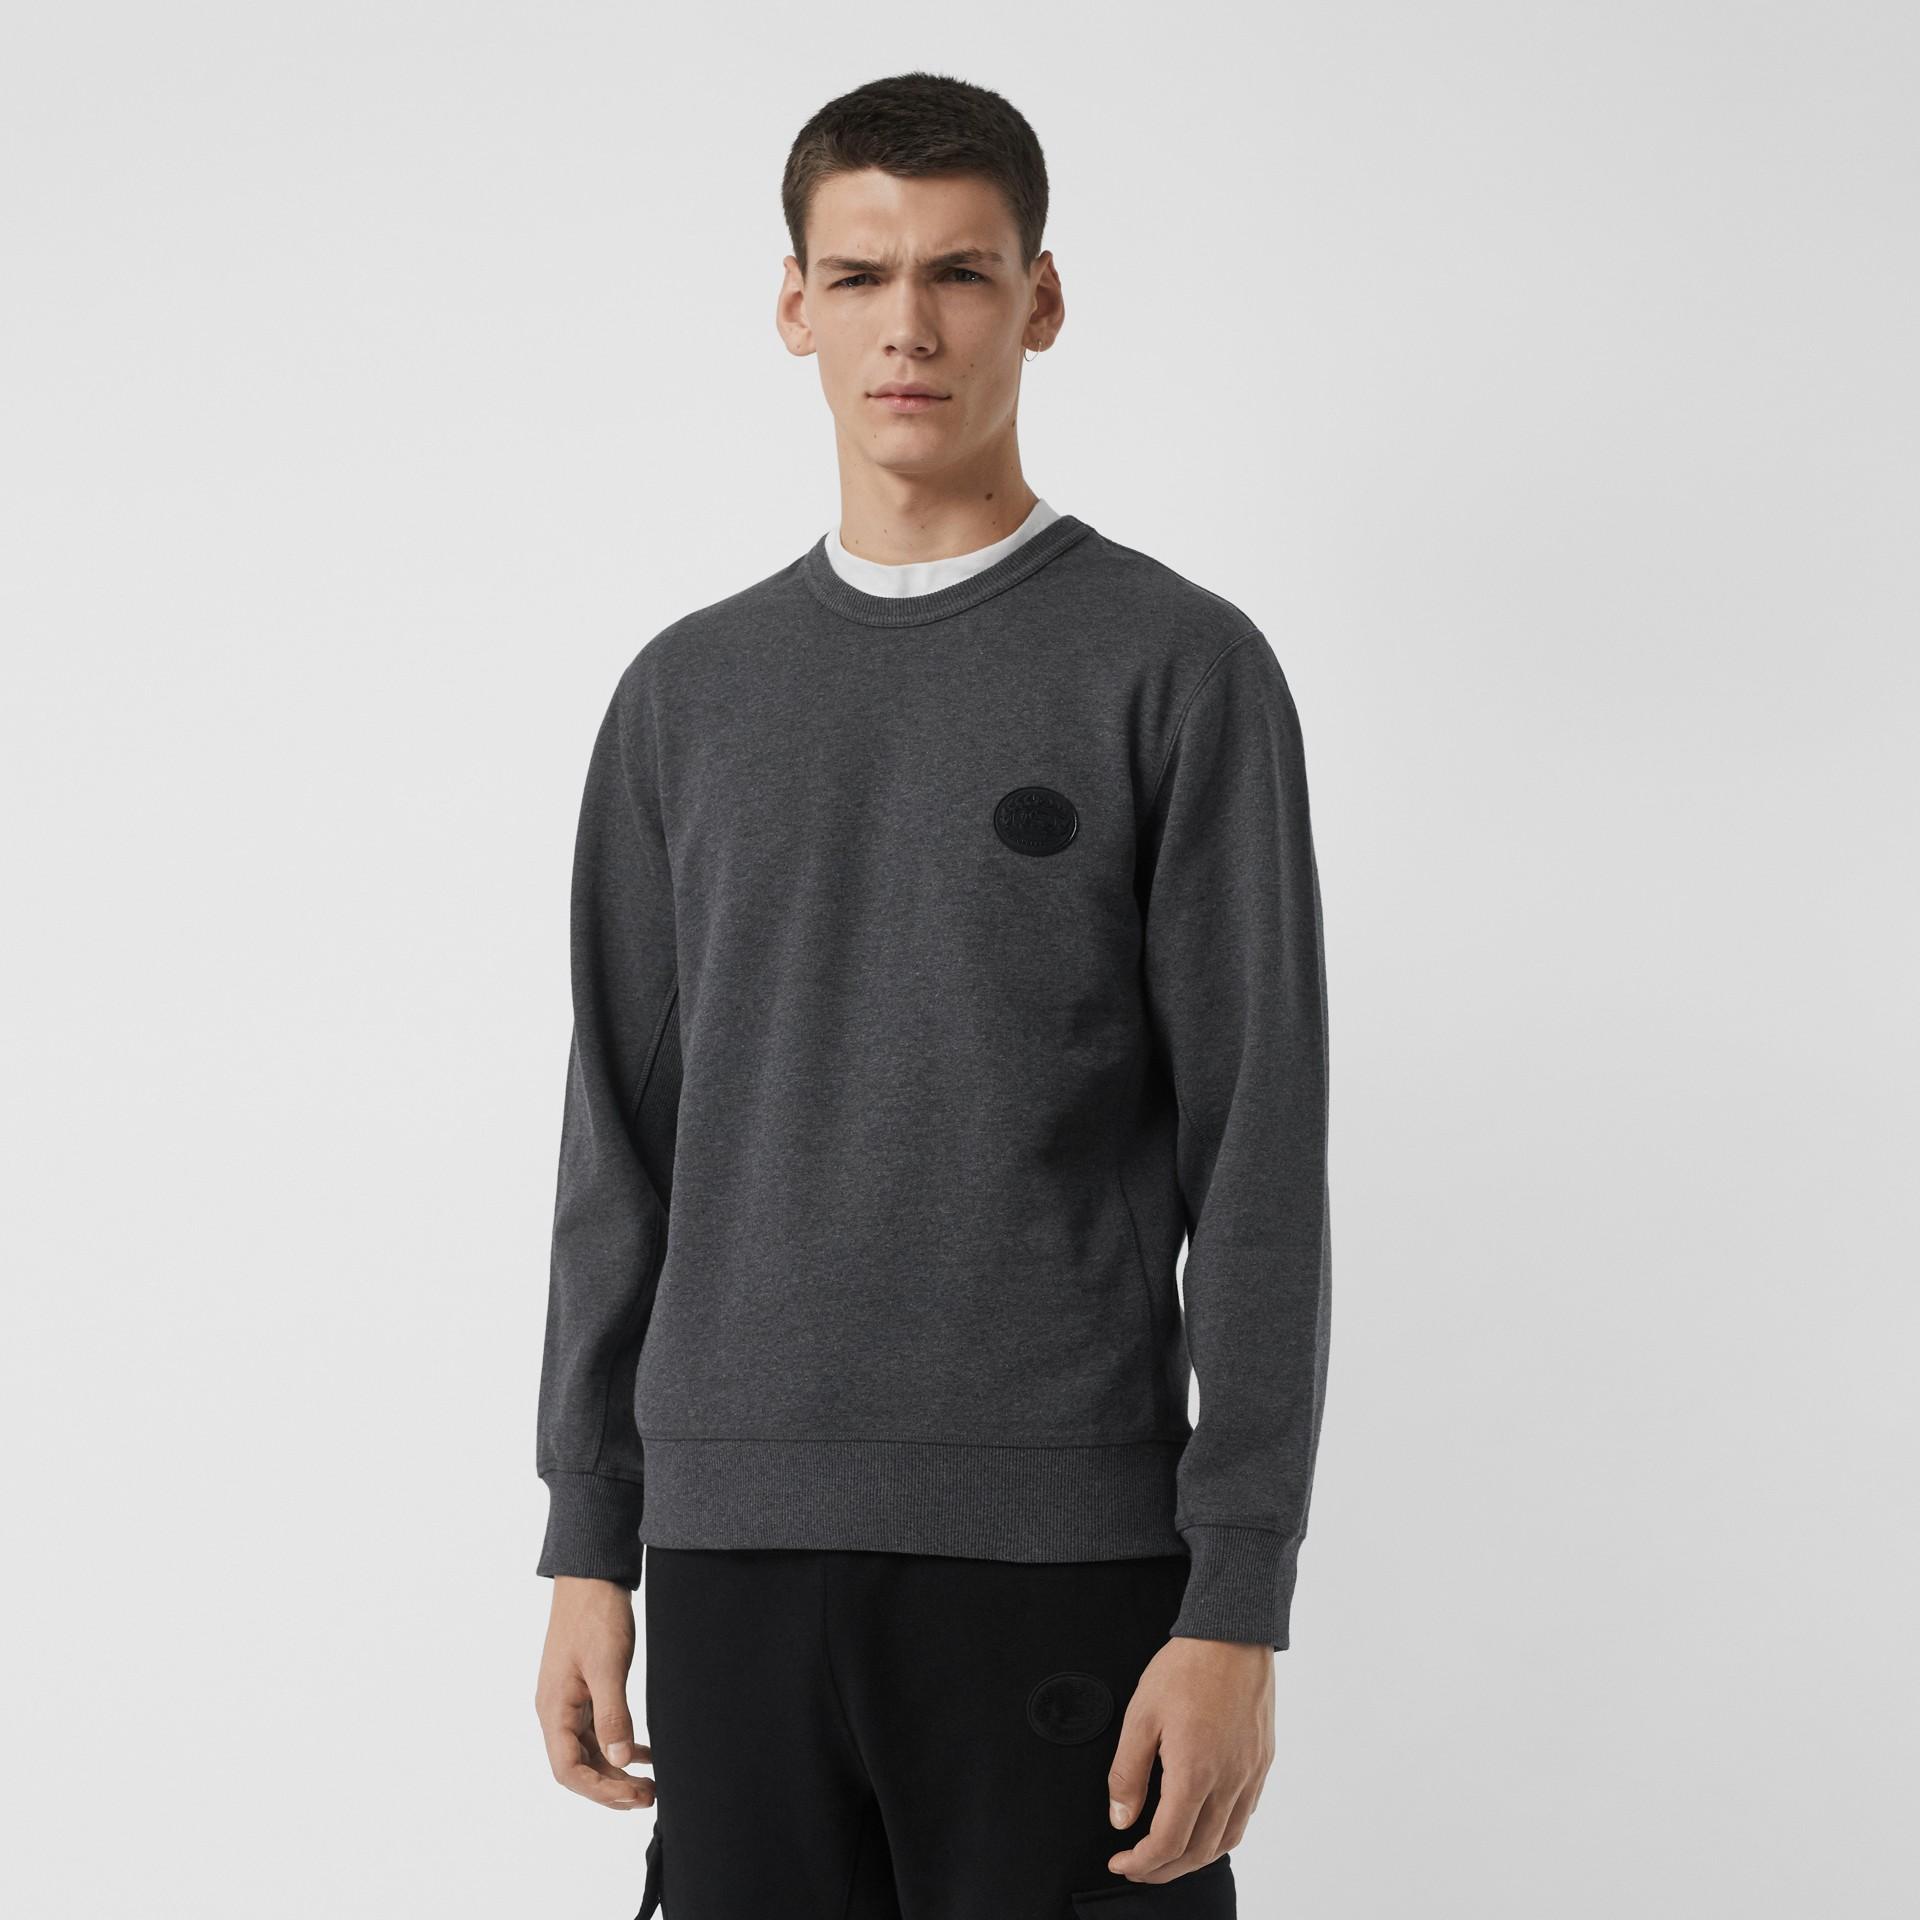 Embroidered Crest Cotton Sweatshirt in Mid Grey Melange - Men | Burberry United Kingdom - gallery image 0